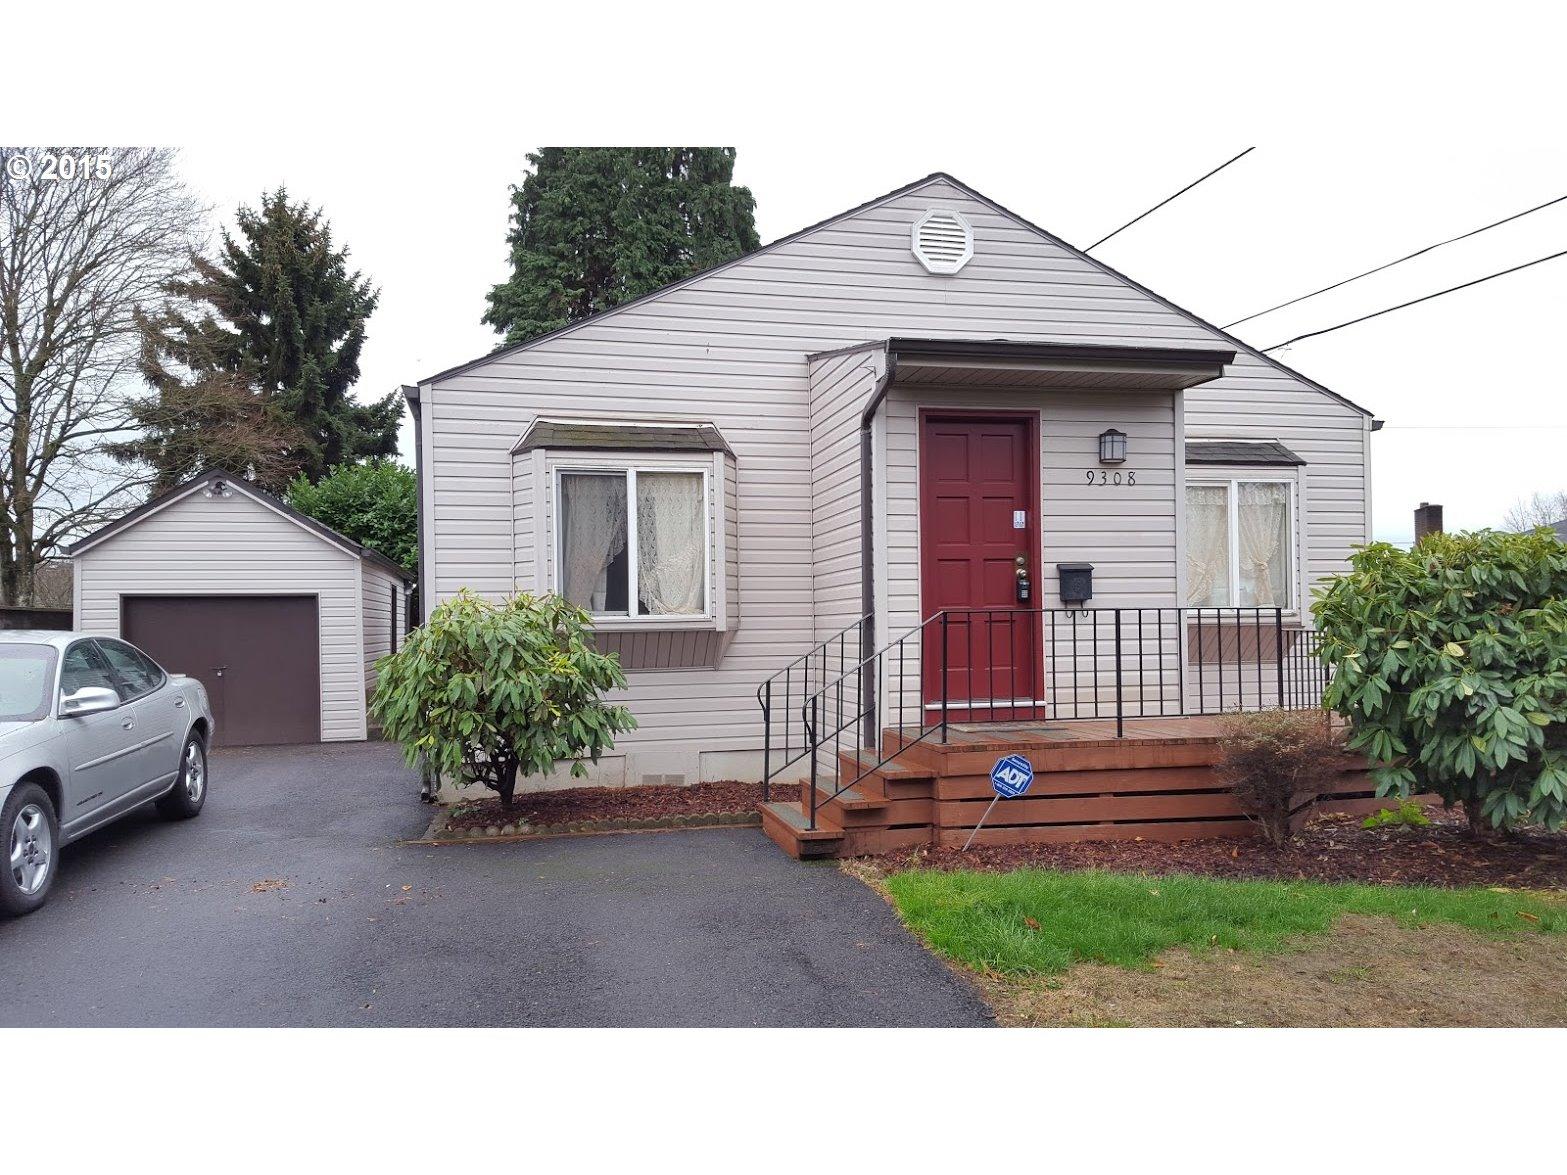 9308 E Burnside St, Portland, OR